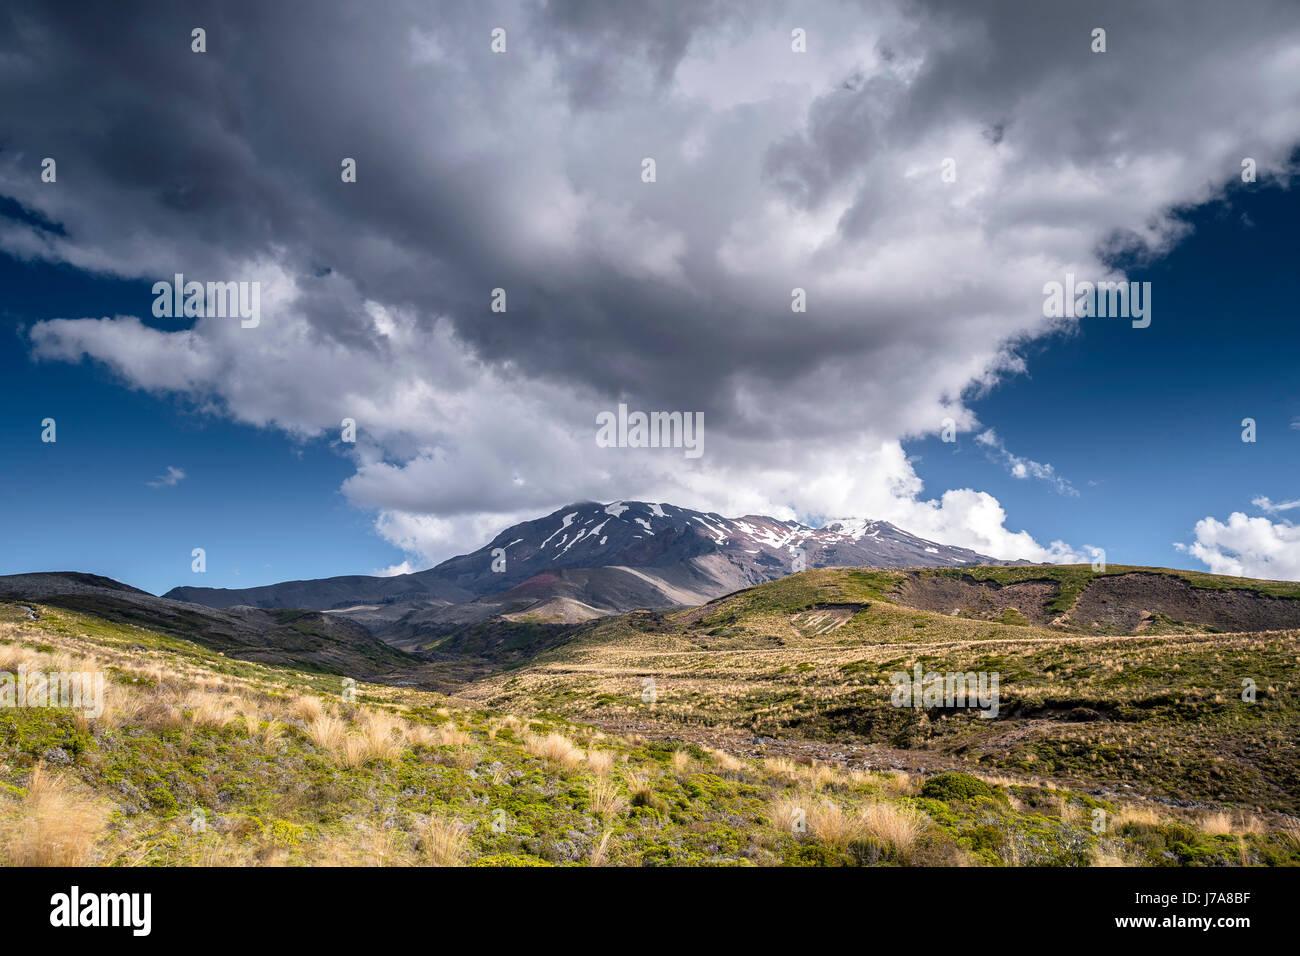 New Zealand, Ruapehu District, Tongariro National Park, Mount Ruapehu, Mount Te Heuheu - Stock Image